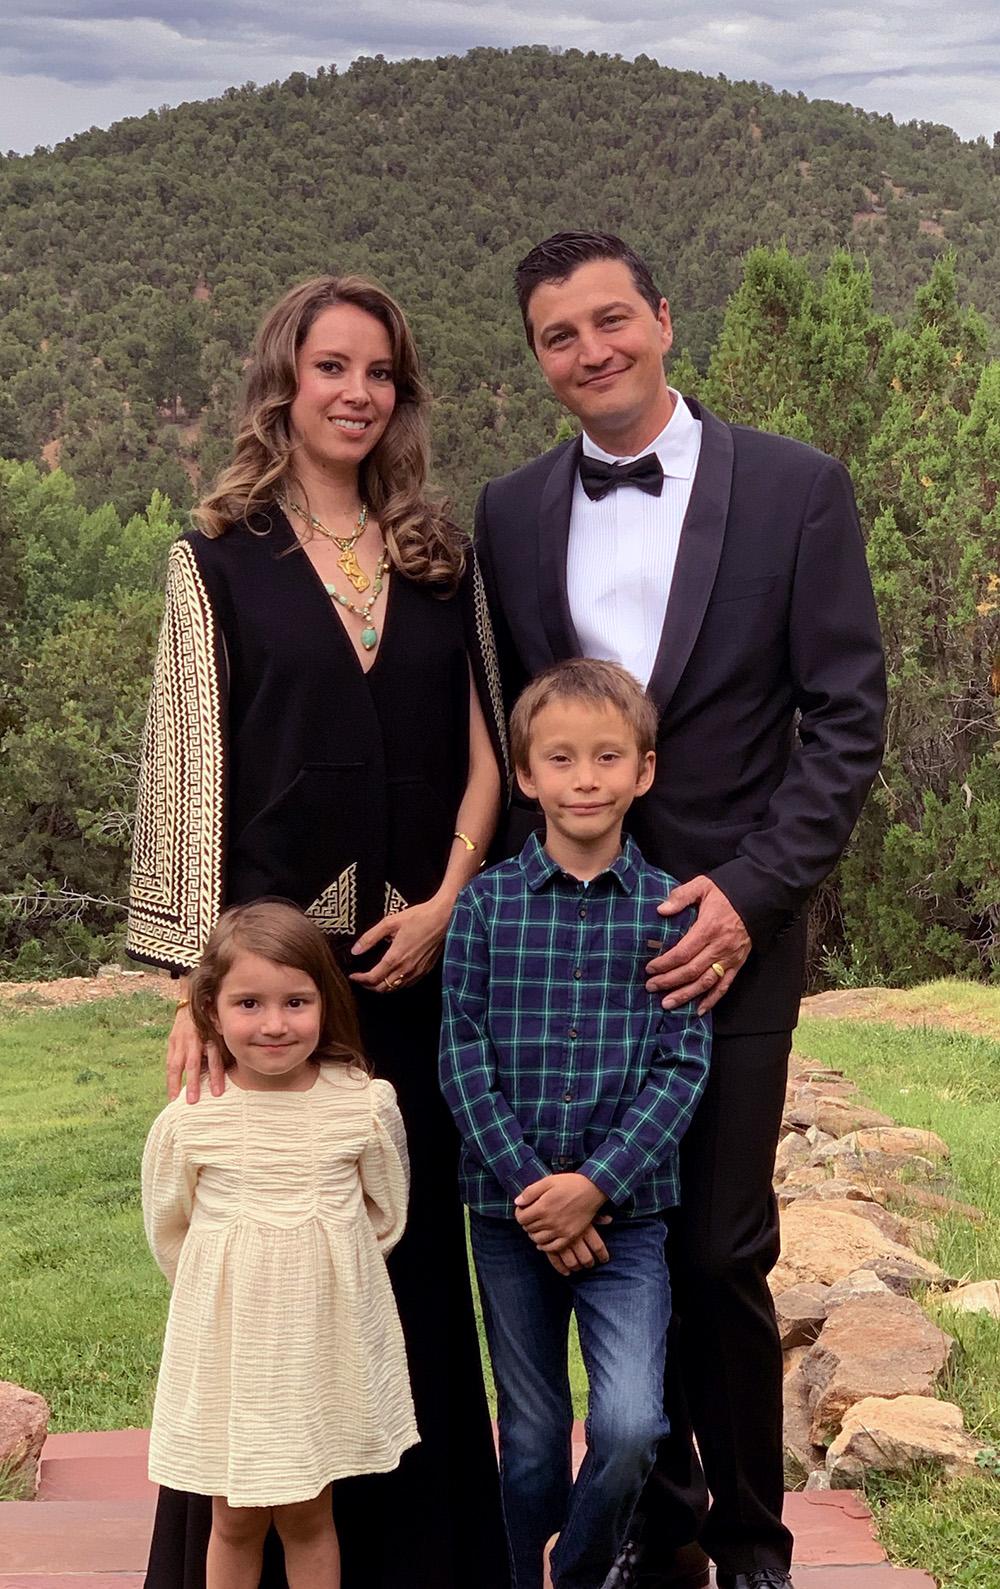 Ajna Seret with Roberta Seret and children